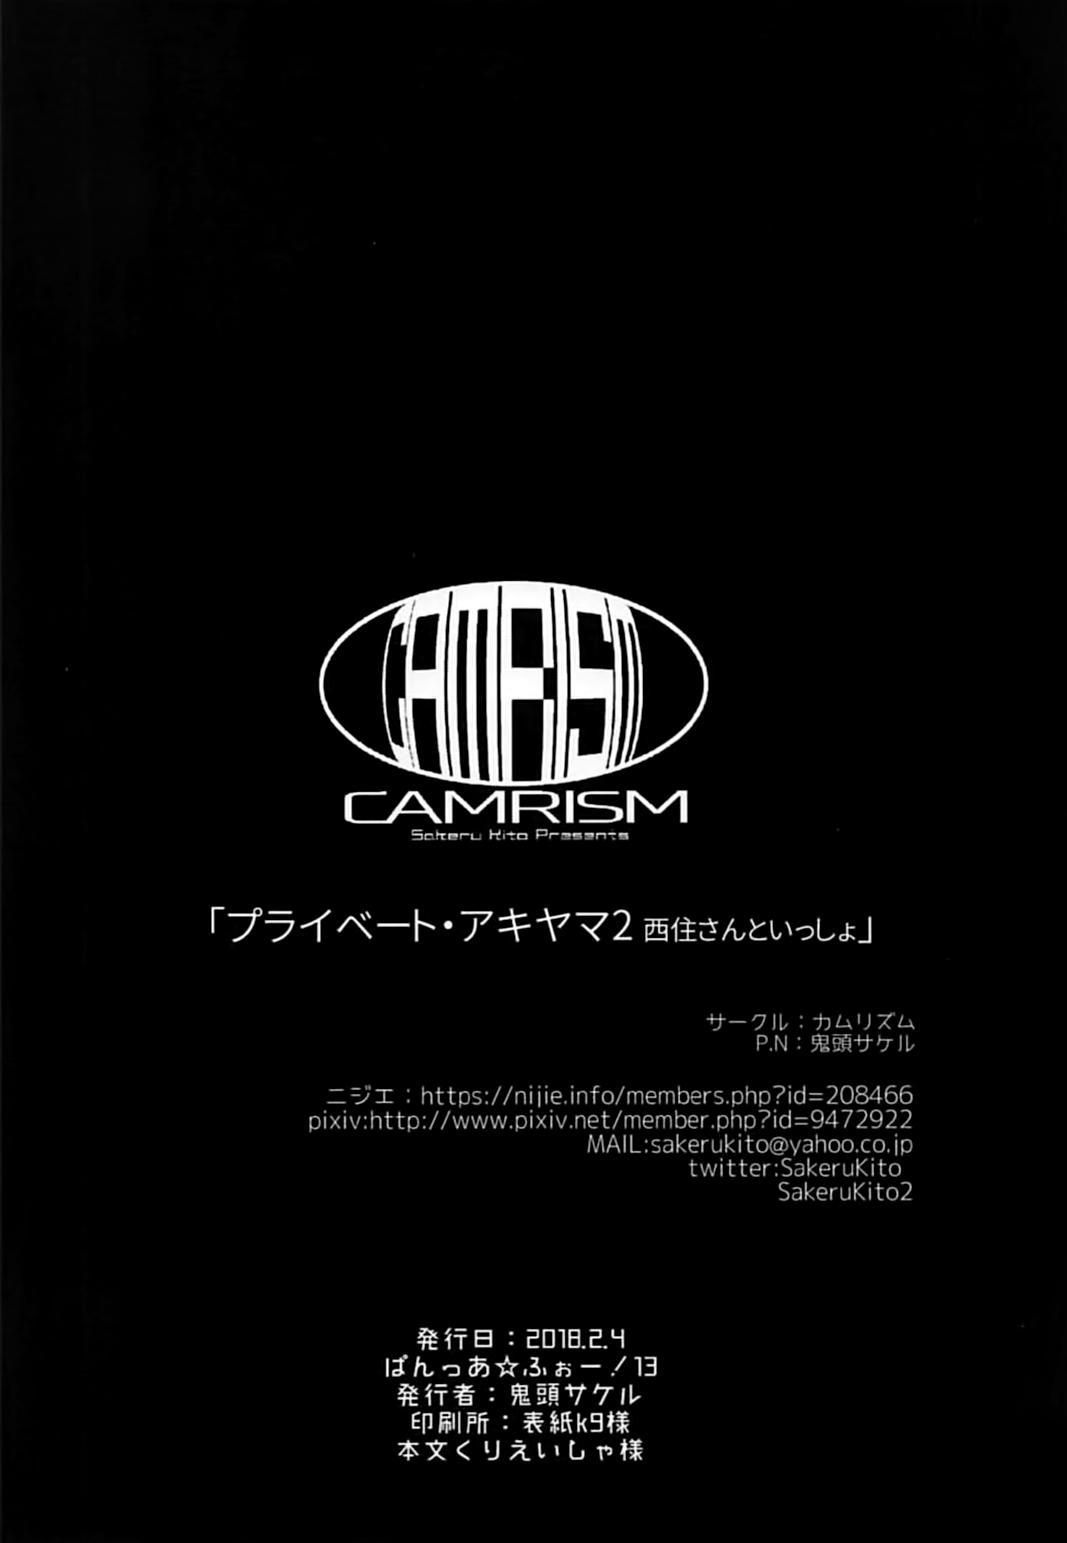 (Panzer Vor! 13) [Camrism (Kito Sakeru)] Private Akiyama 2 - Nishizumi-san to Issho (Girls und Panzer) [Chinese] [沒有漢化] 25